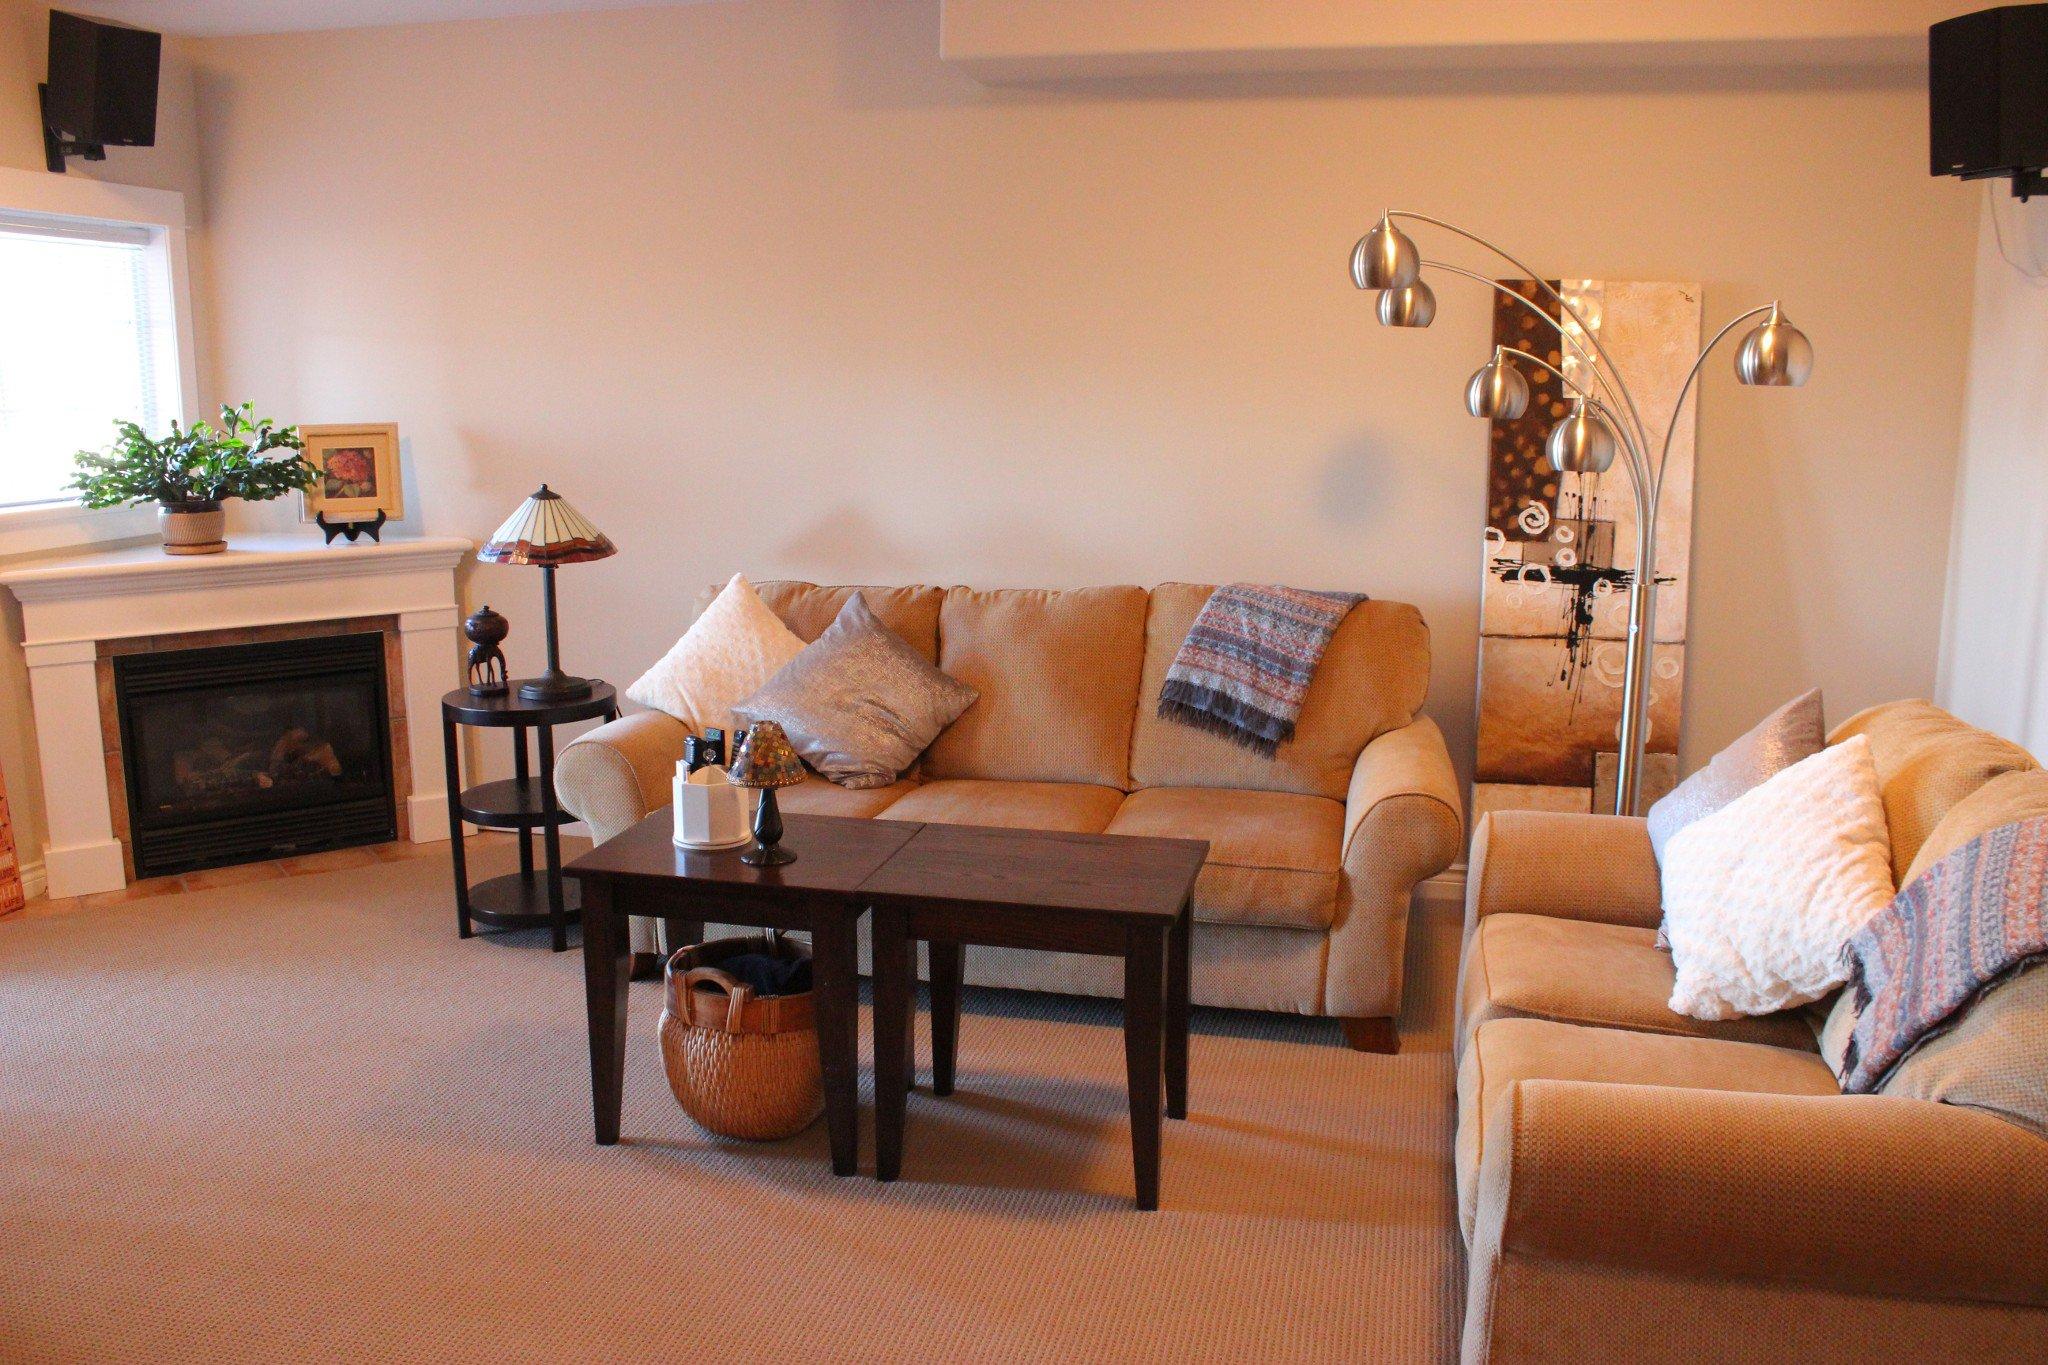 Photo 27: Photos: 101 875 Sahali Terrace in Kamloops: Lower Sahali Townhouse for sale : MLS®# 154556